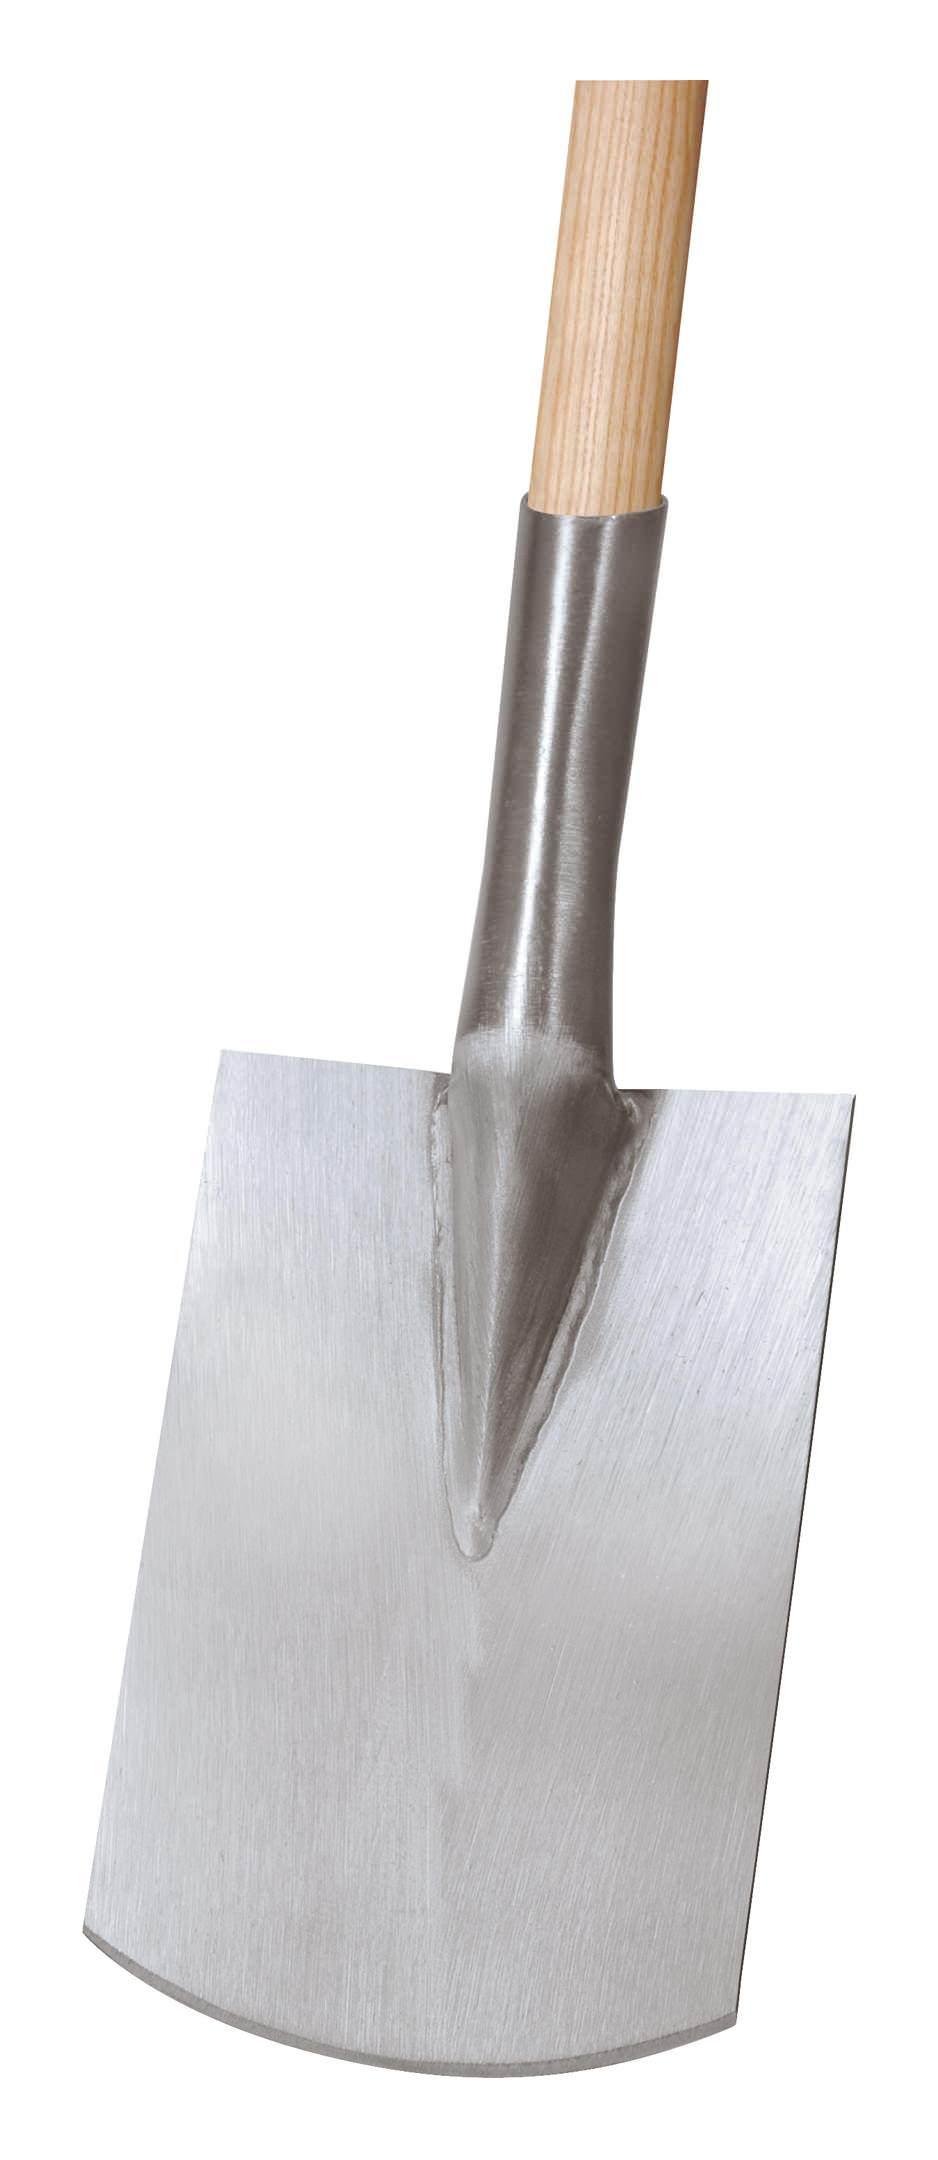 Idealspaten Ideal Damenspaten Rohrdüll poliert - 27300210